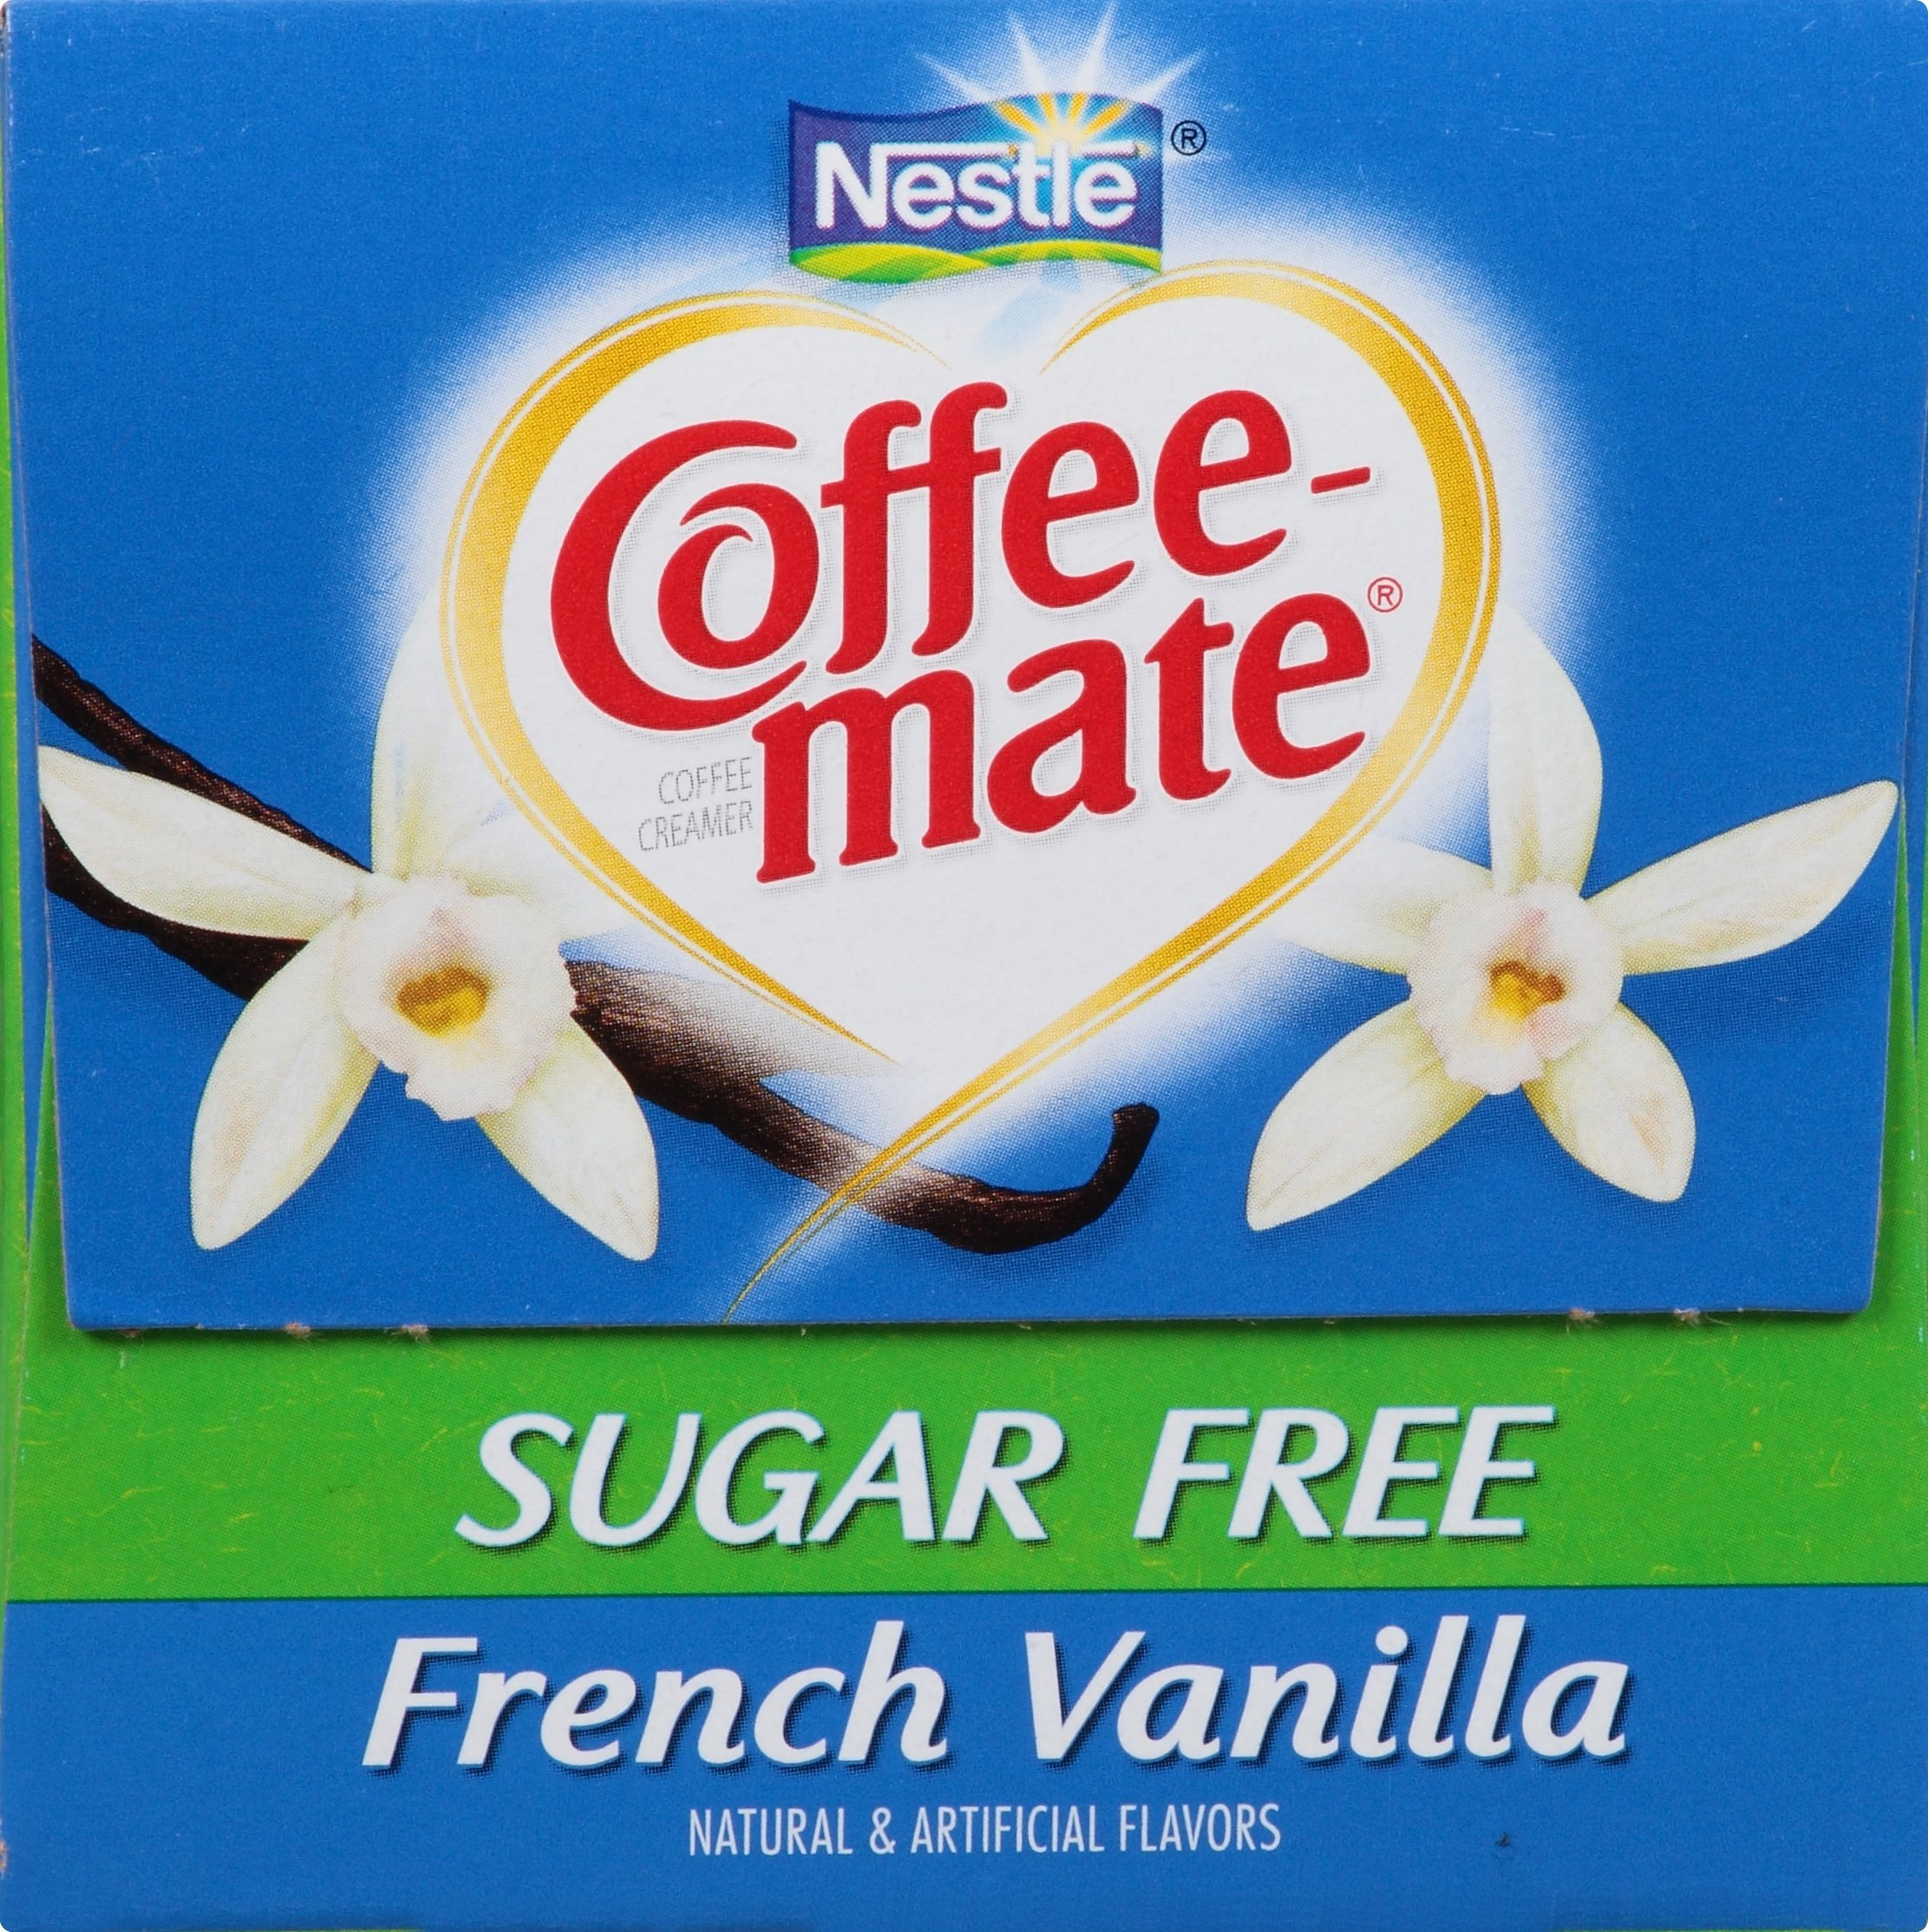 NESTLE COFFEE-MATE Coffee Creamer, Sugar Free French Vanilla, liquid creamer singles, Pack of 50 by Nestle Coffee Mate (Image #6)